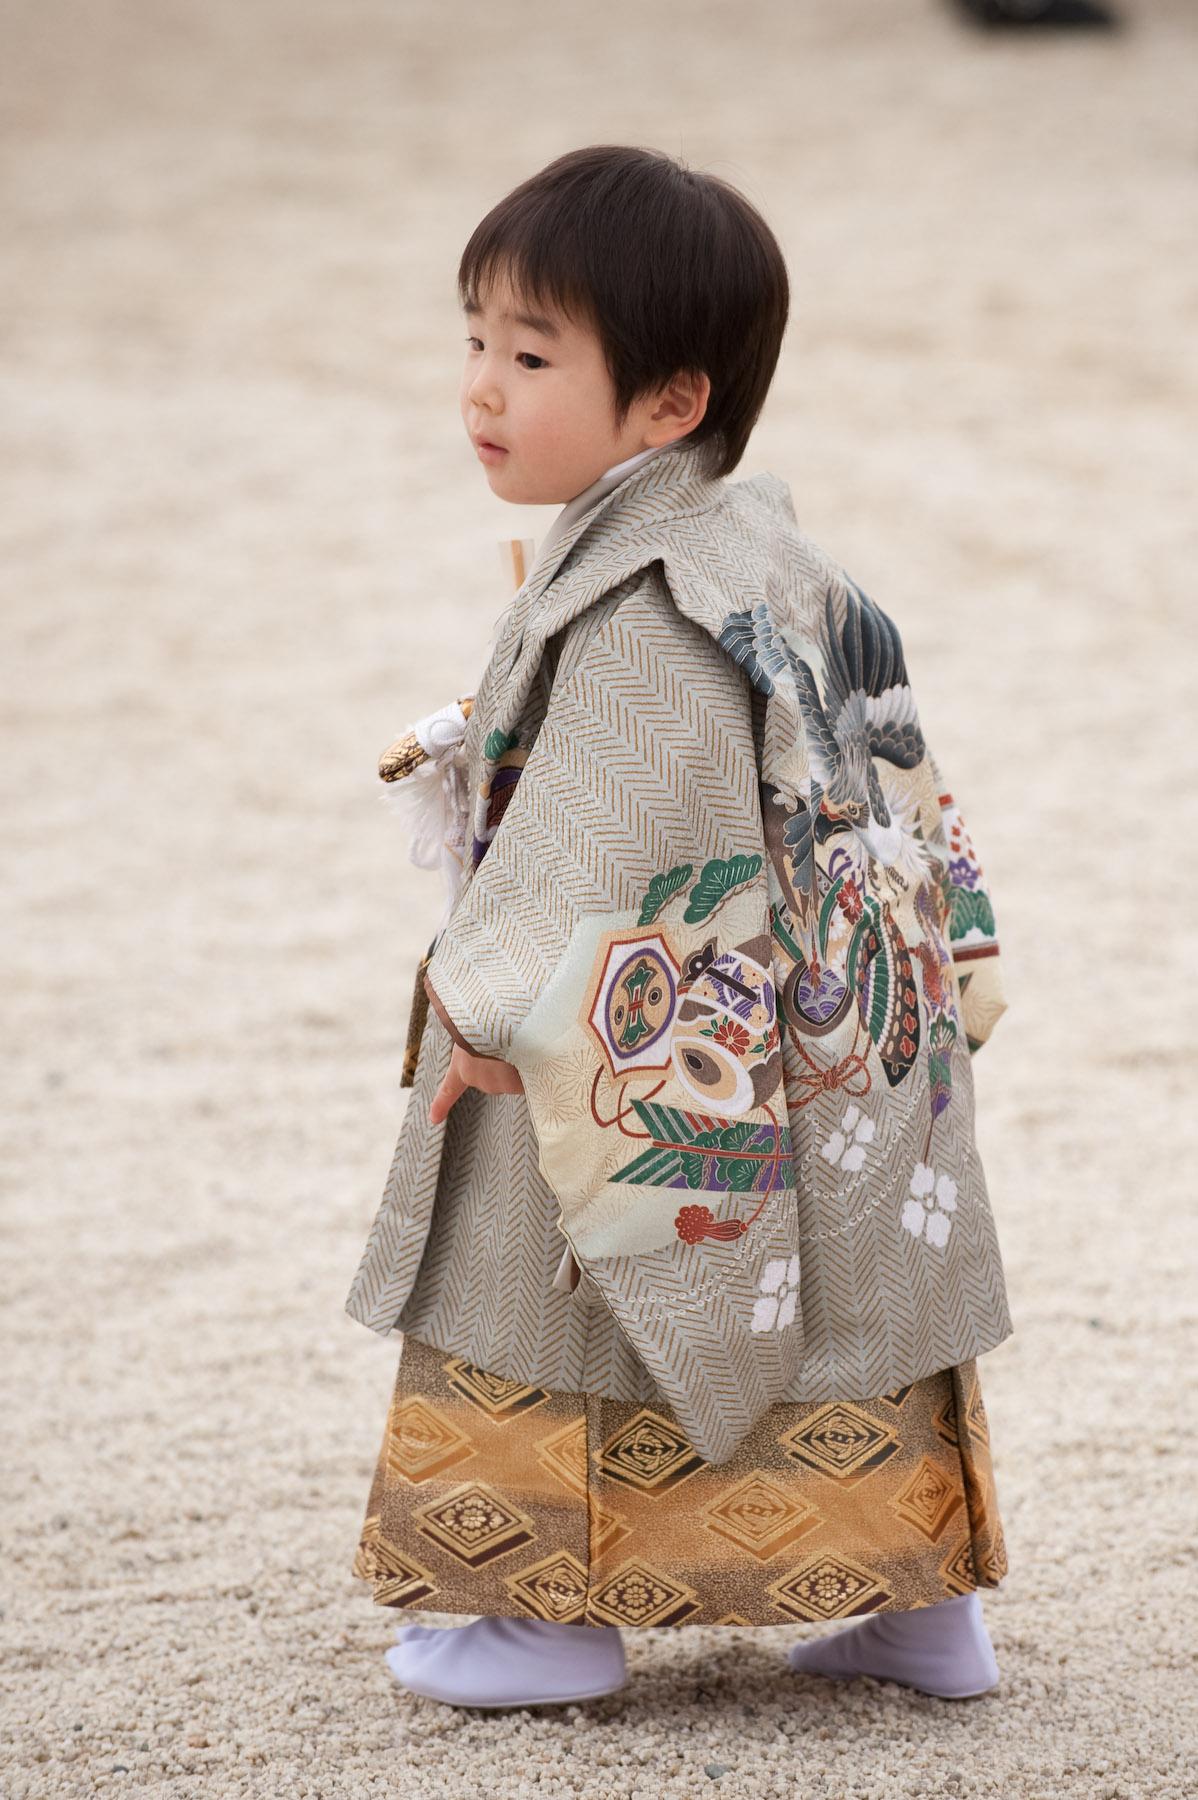 Cute Boys Aged 10 Ask Com Image Search: Jeffrey Friedl's Blog » Kids In Kimono: Cute Enough To Eat